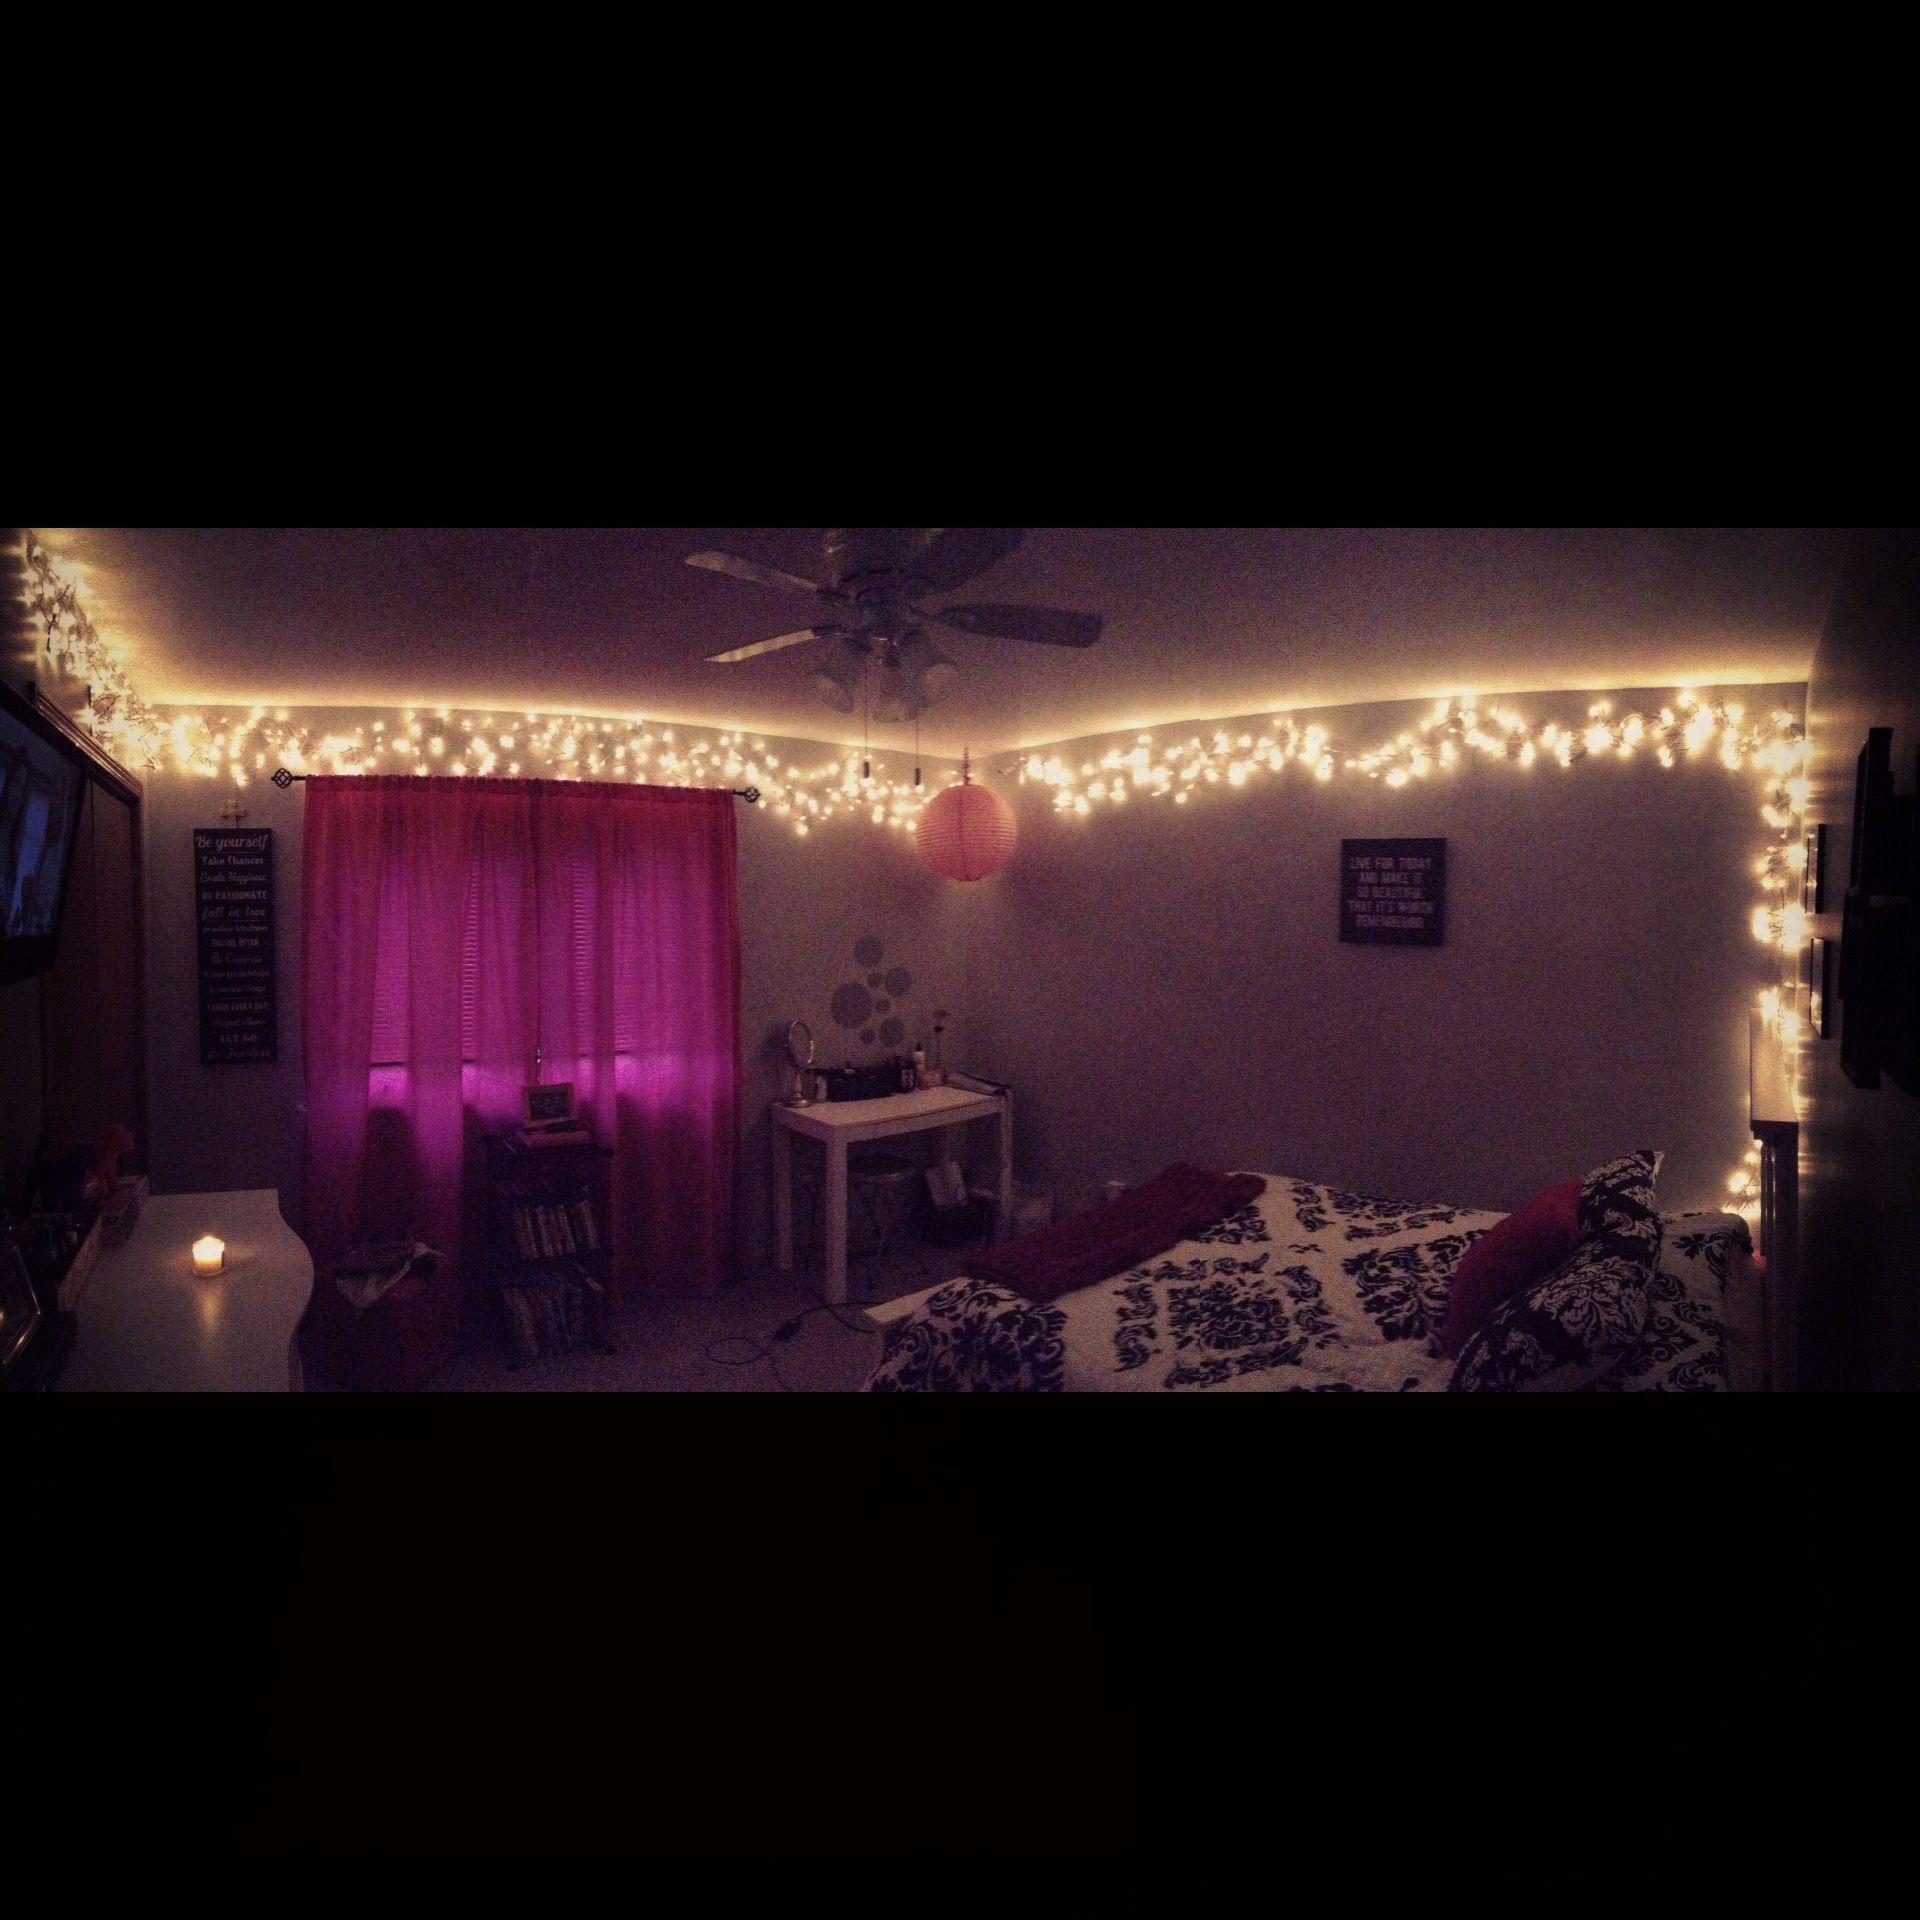 Bedroom With Christmas Lights Soooo Calming Calming Bedroom